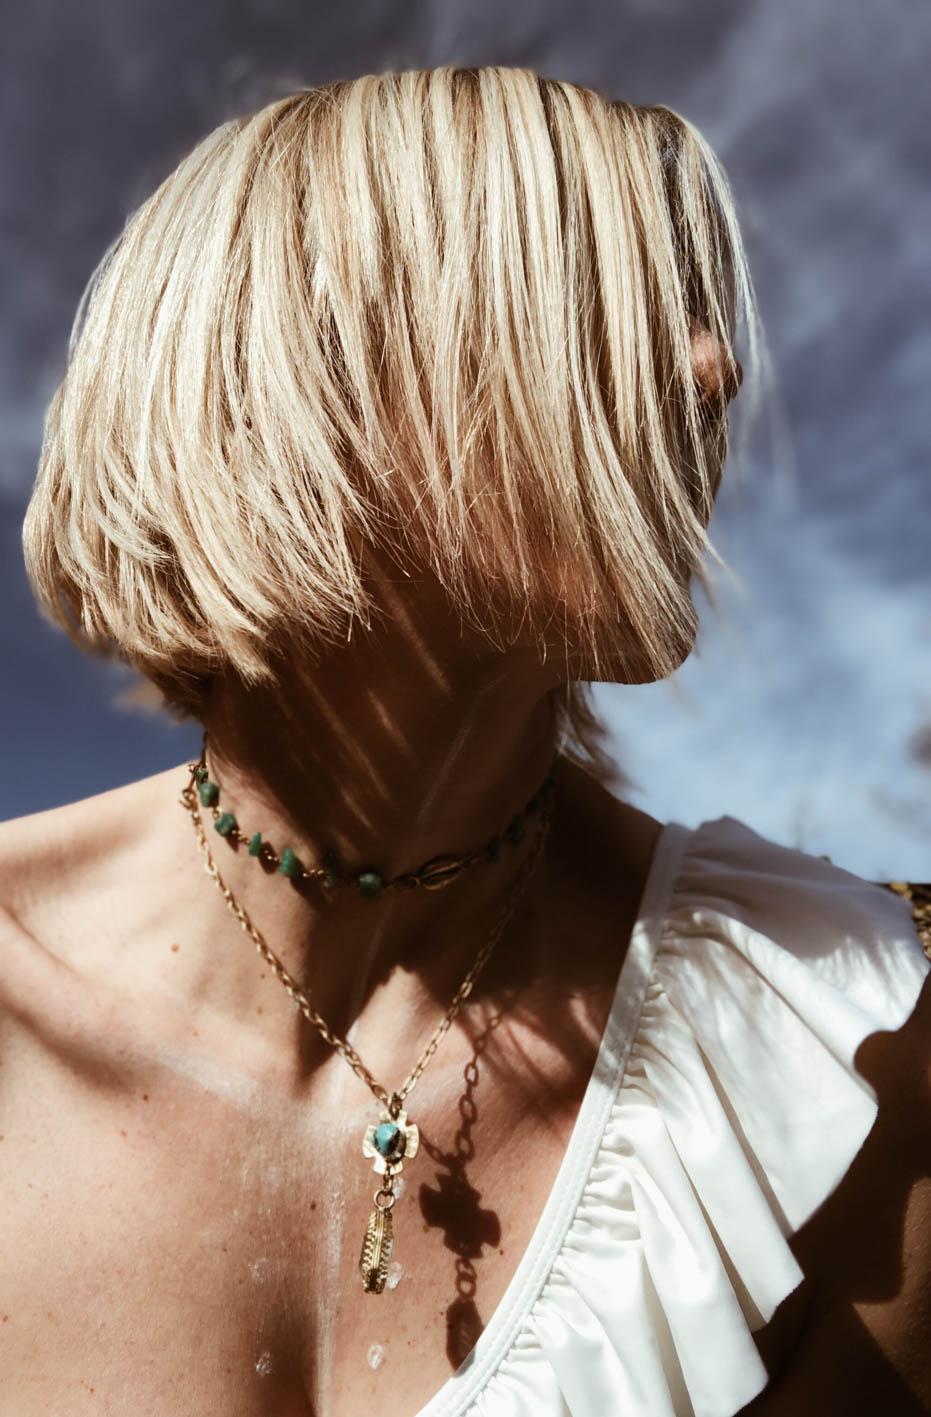 Carnet sauvage- blog mode et tendances - christina rose jewelry30.jpg